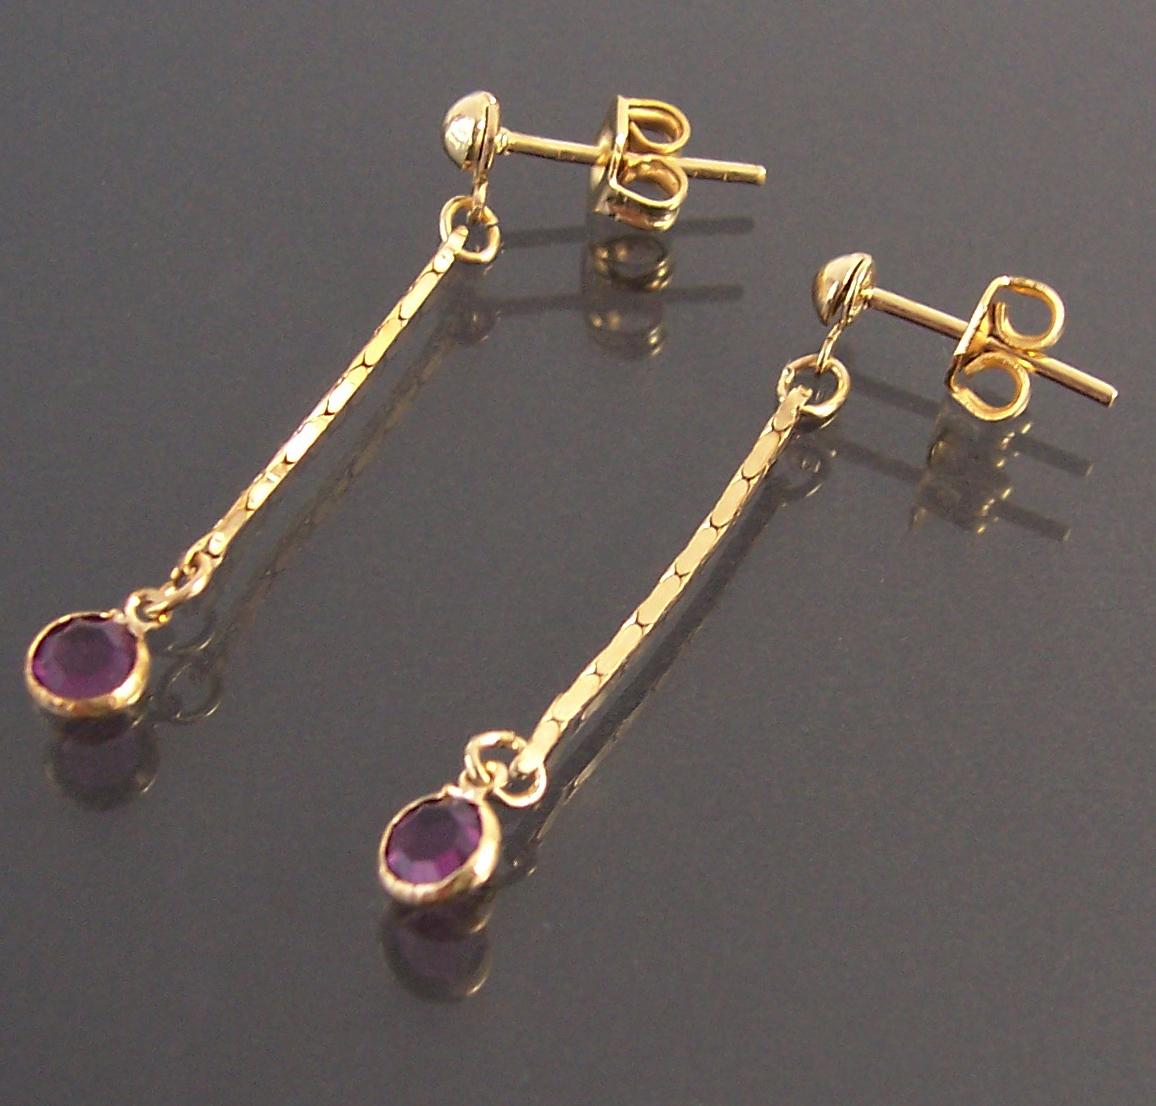 Ohrringe Stecker Ohrhänger 3cm Gold plattiert Zirkonia lila Schmuck O1126